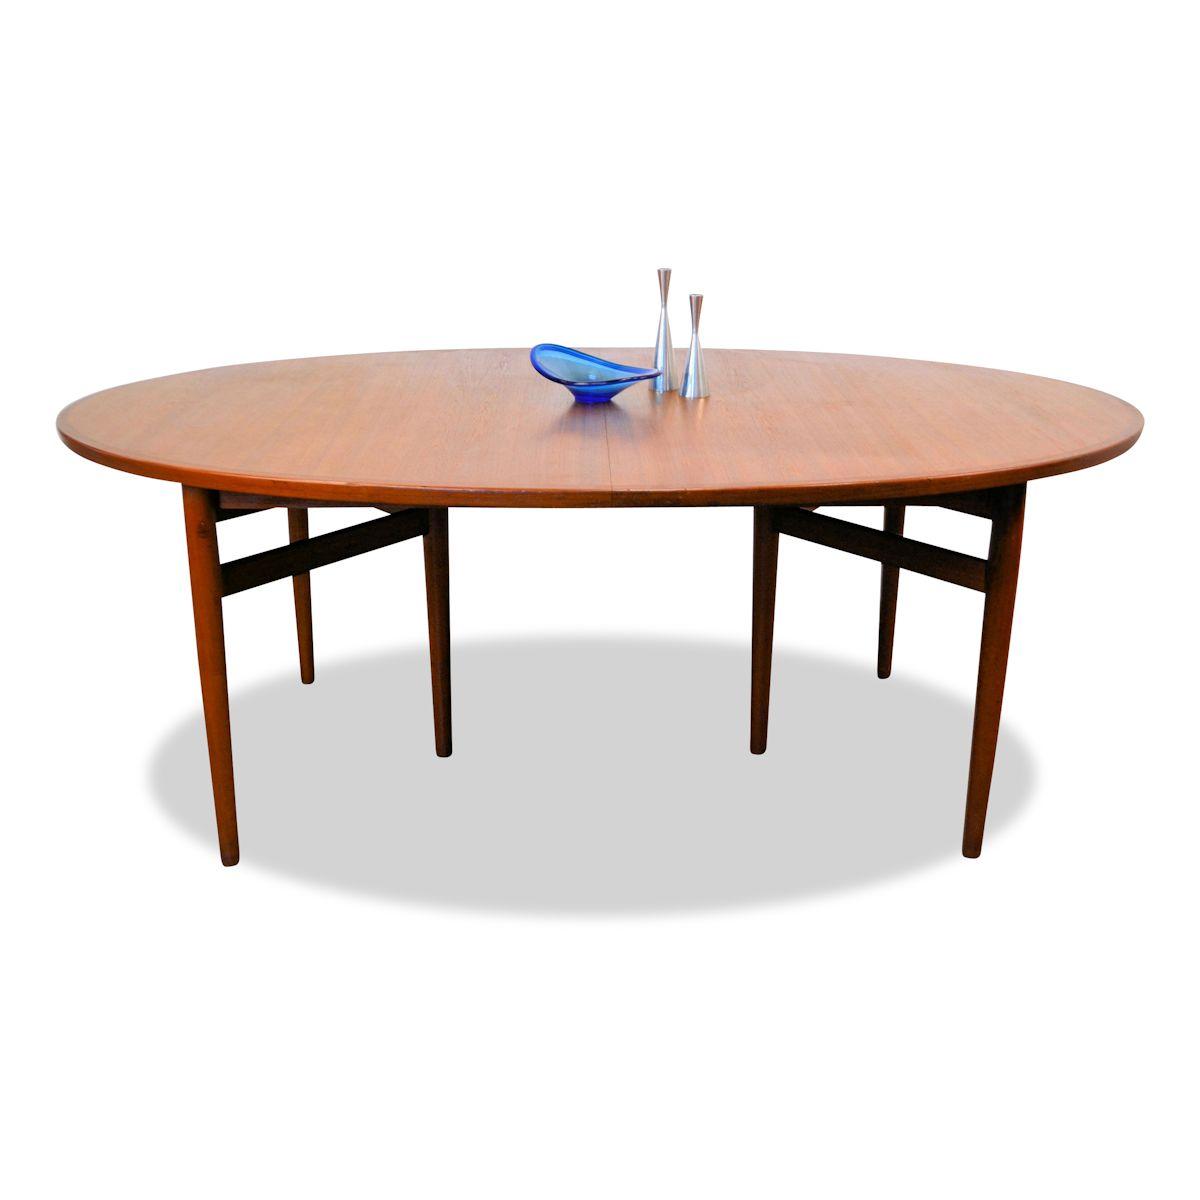 Arne Vodder, model 212 teak ovale eettafel